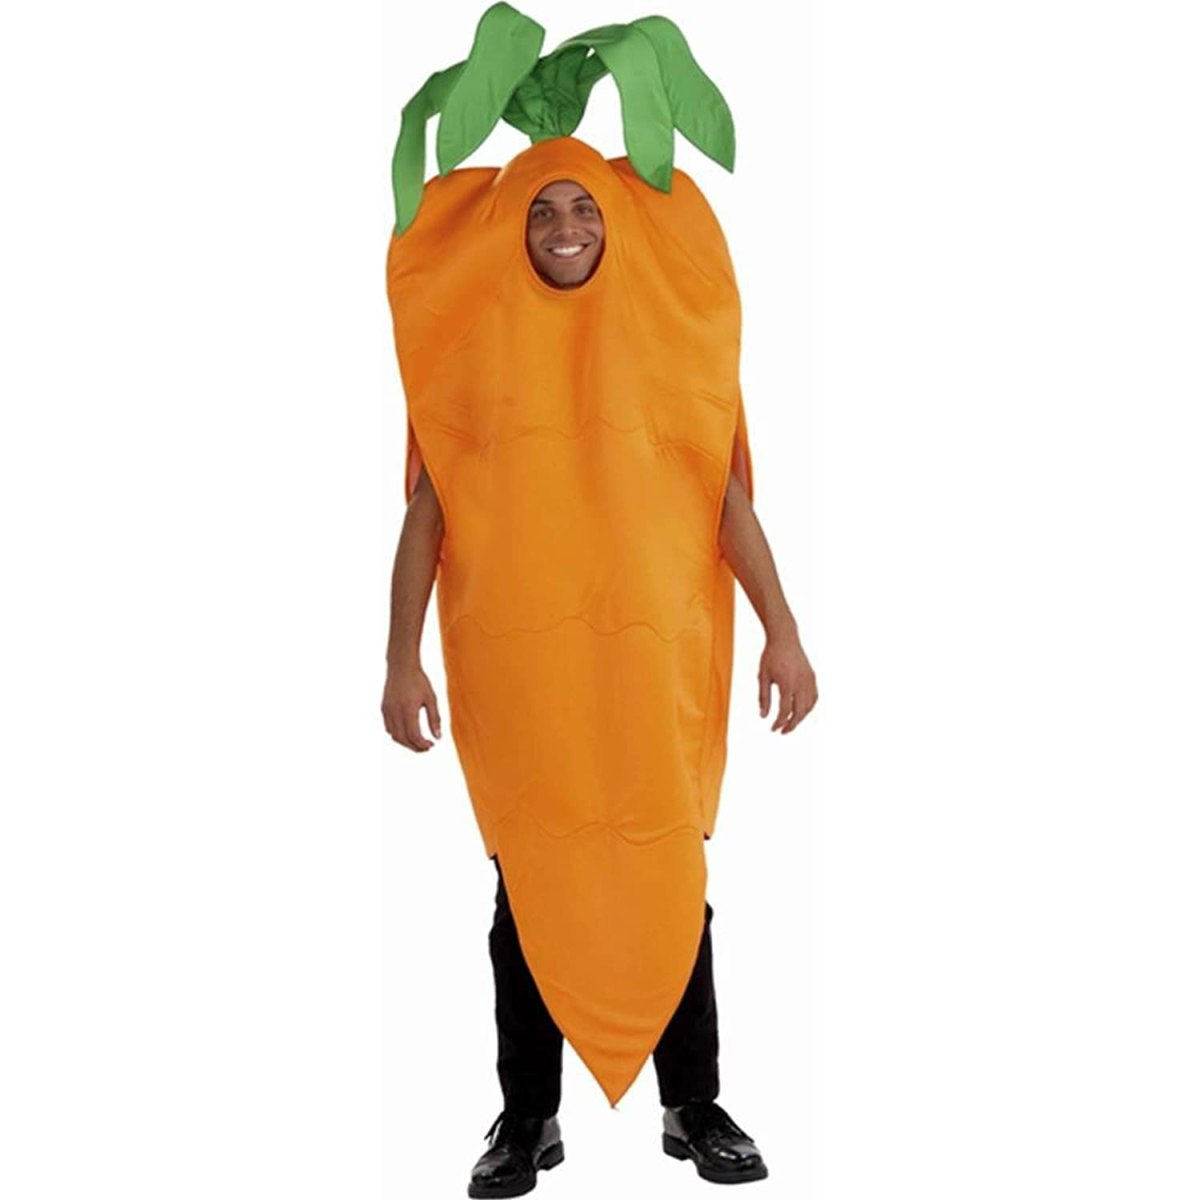 Forum Novelties - Adult Carrot Costume